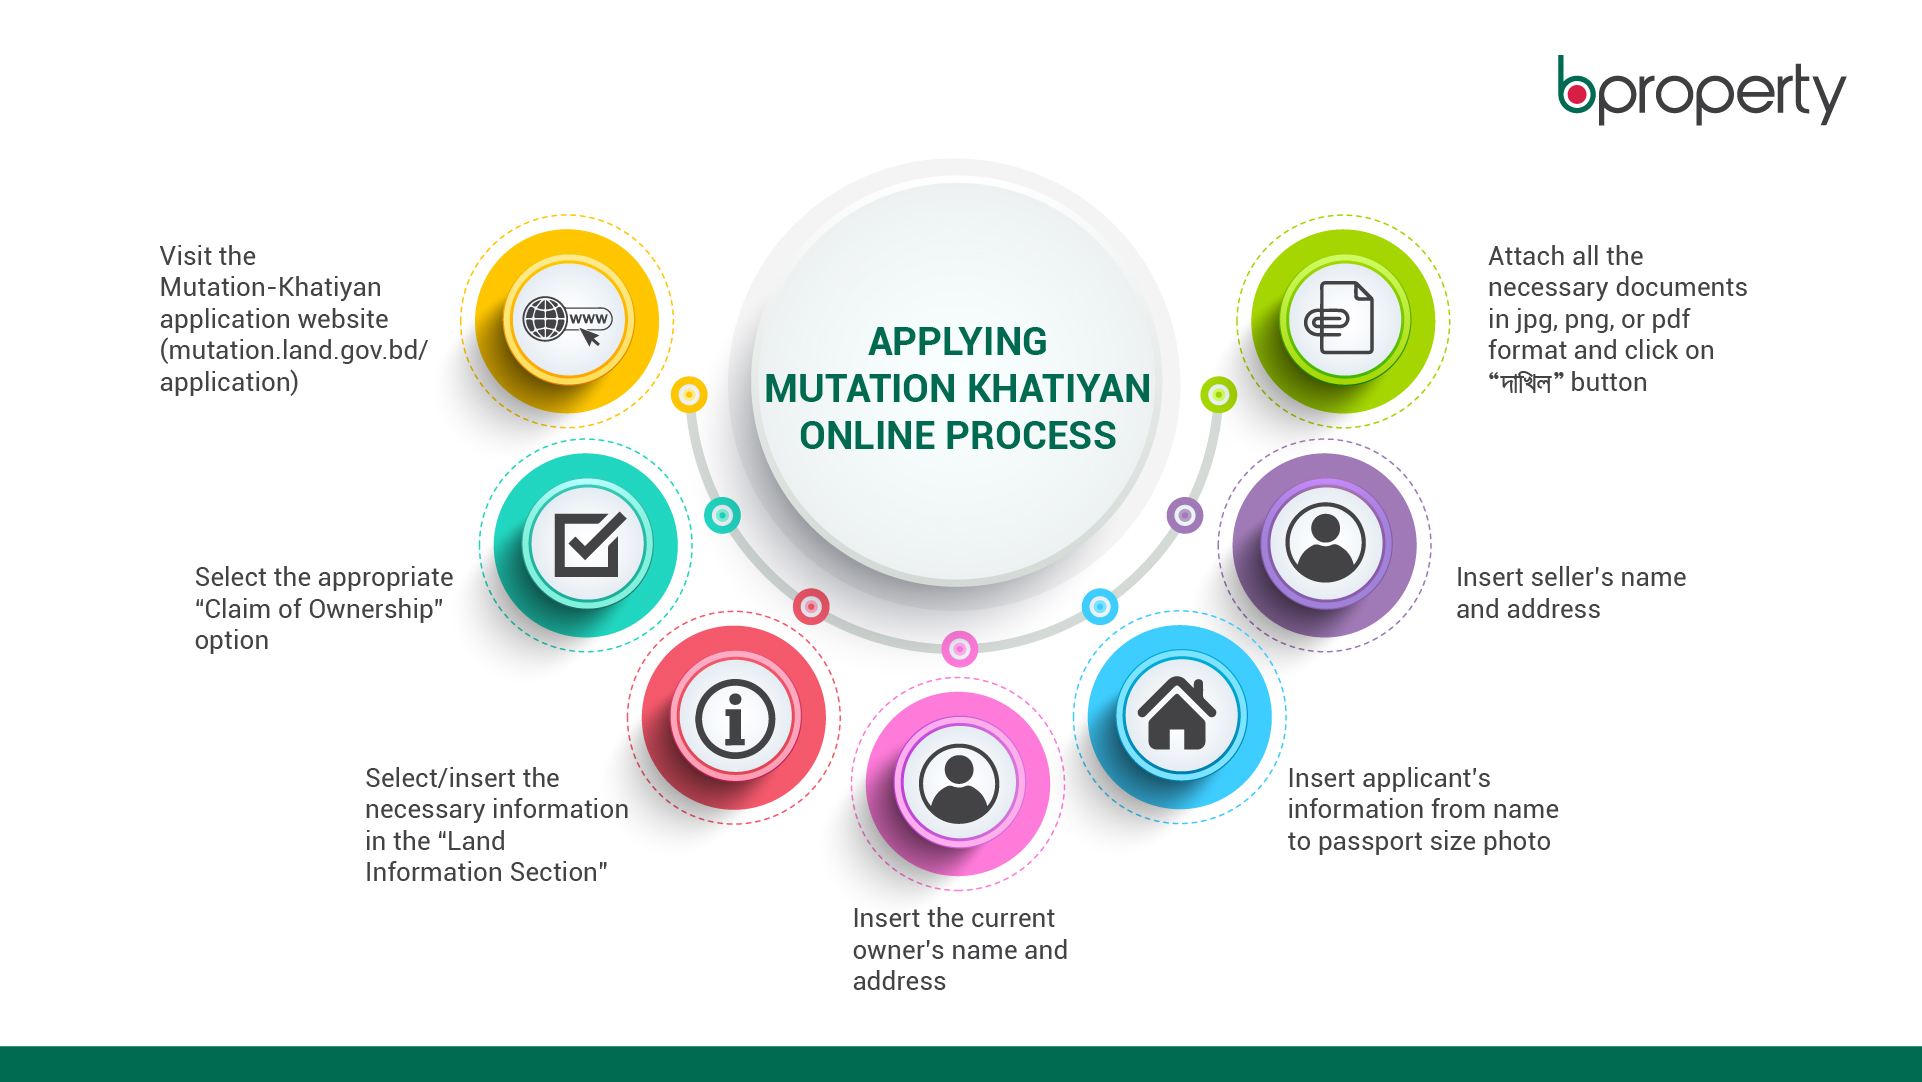 infographic of the Mutation-Khatiyan/Naamjari application online